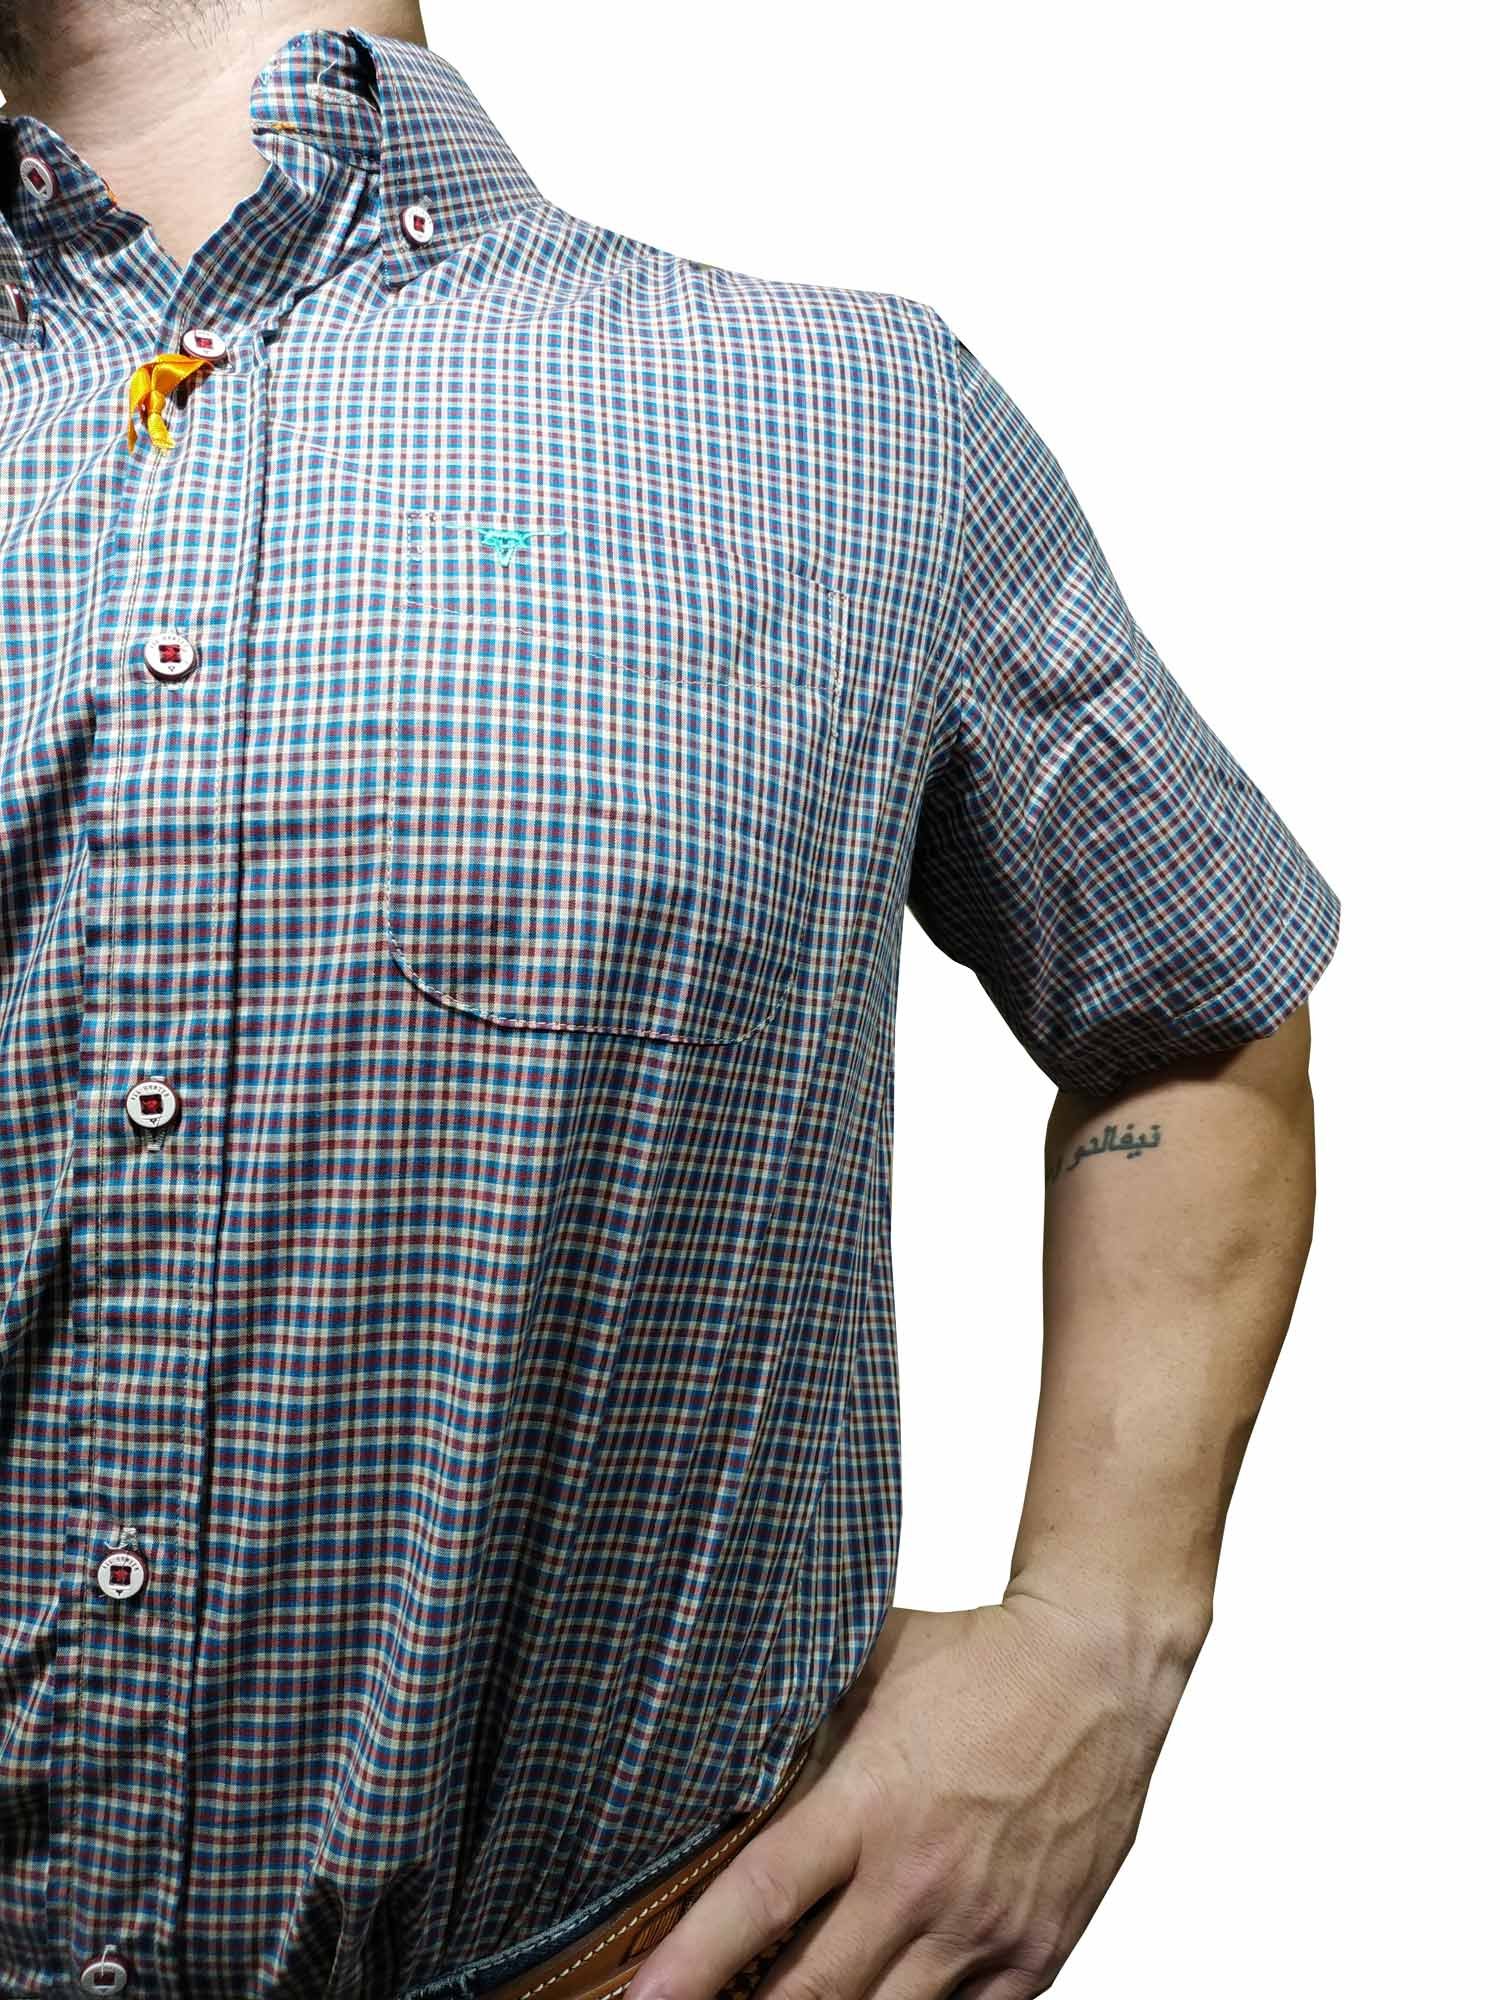 Camisa Masculina All Hunter Manga Curta Ref. 818